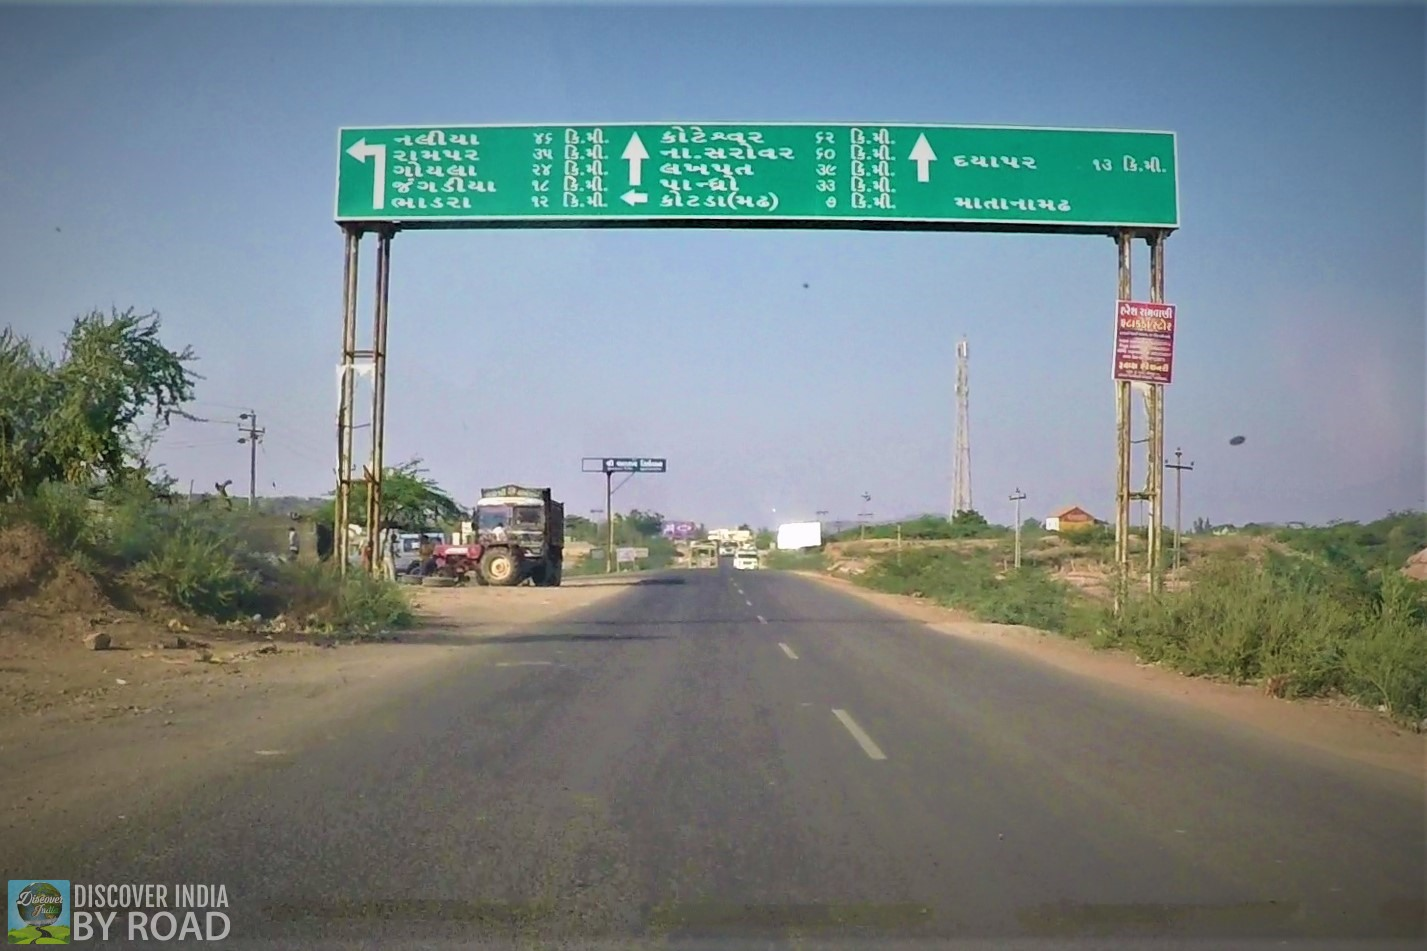 Way to Mata na Madh highway with signboard